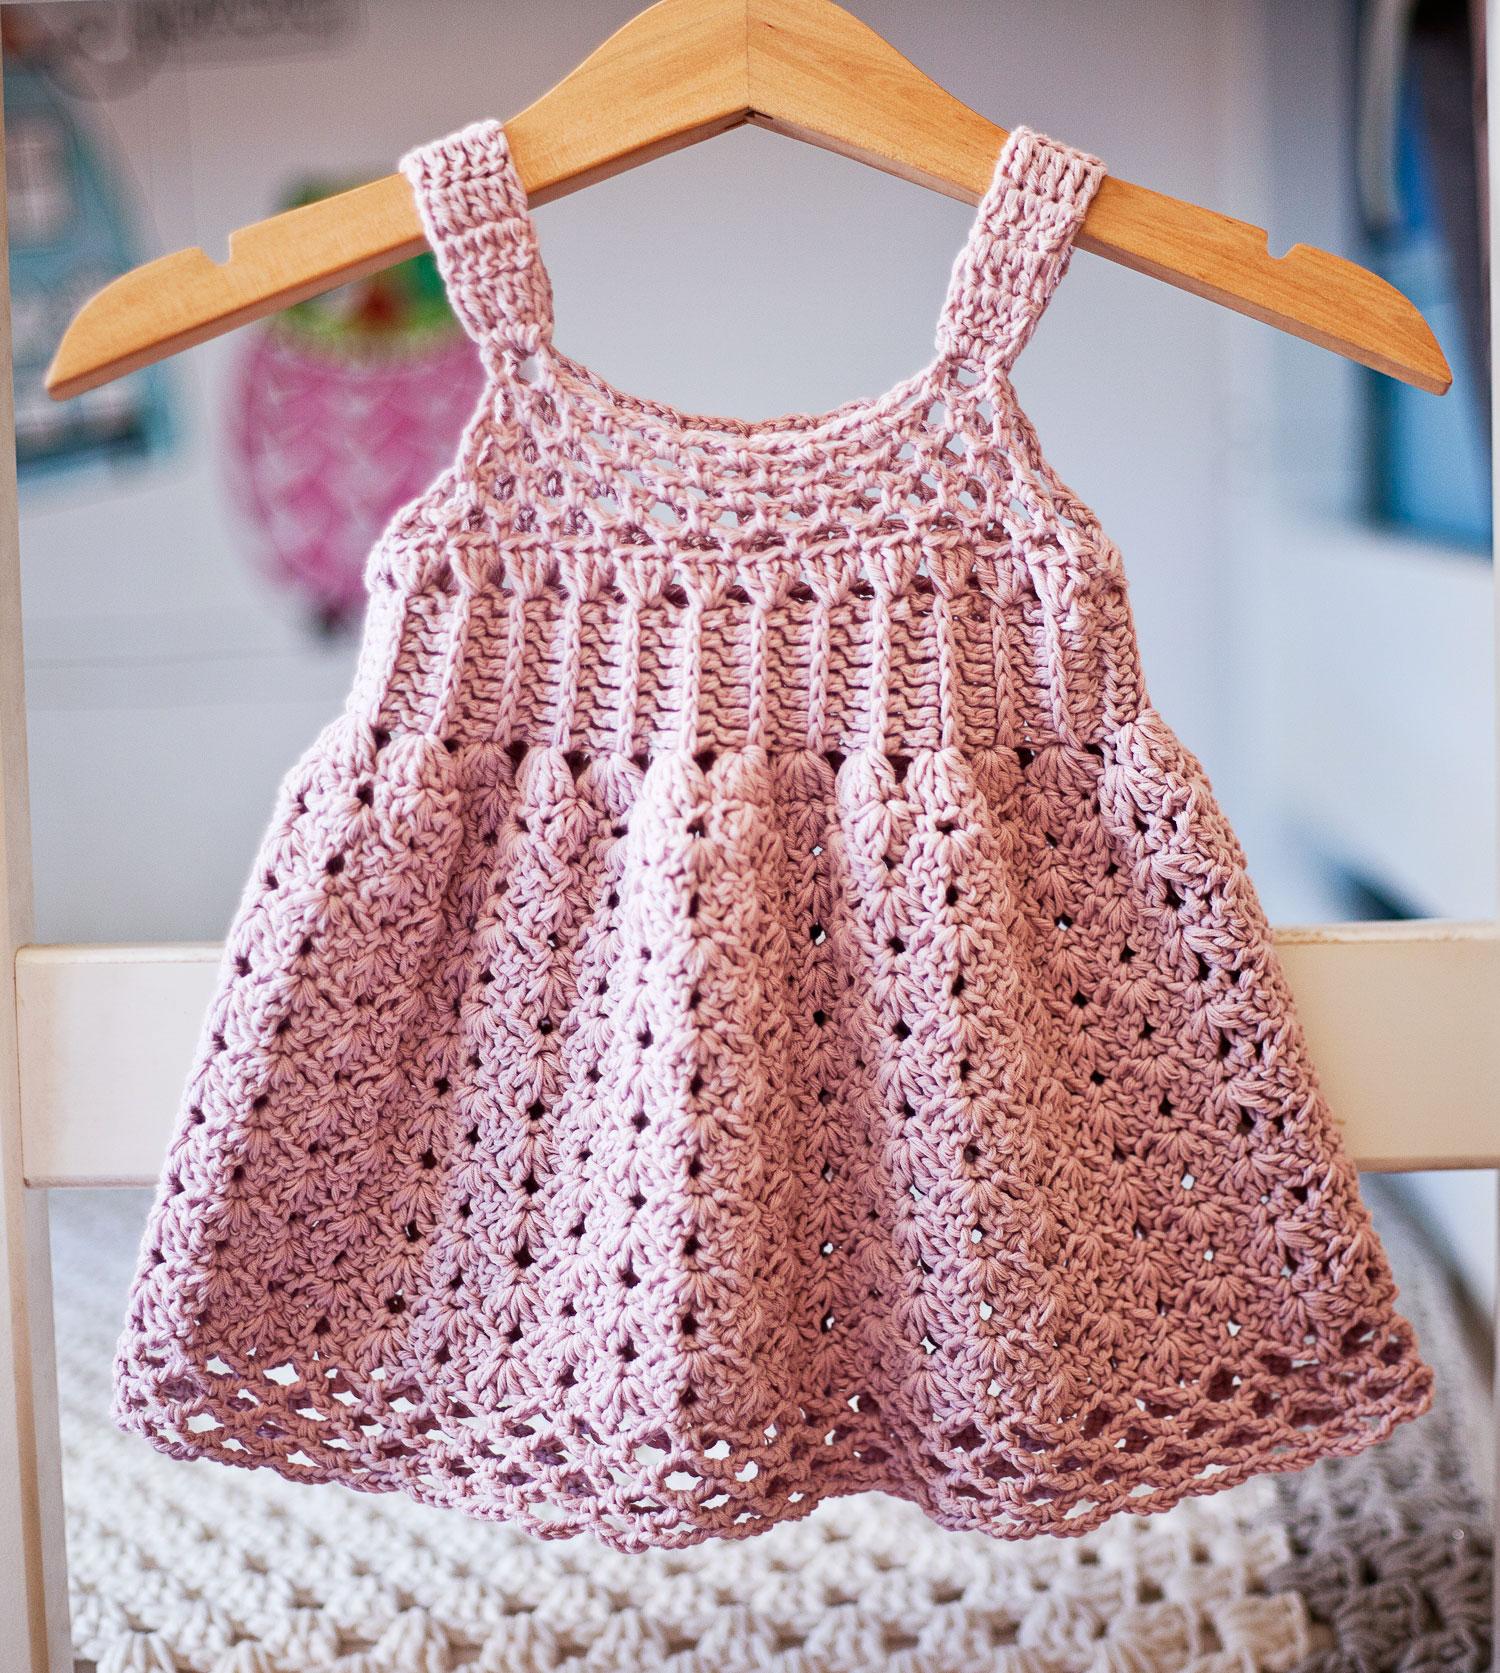 Empire Waist Dress, crochet pattern by Mon Petit Violon